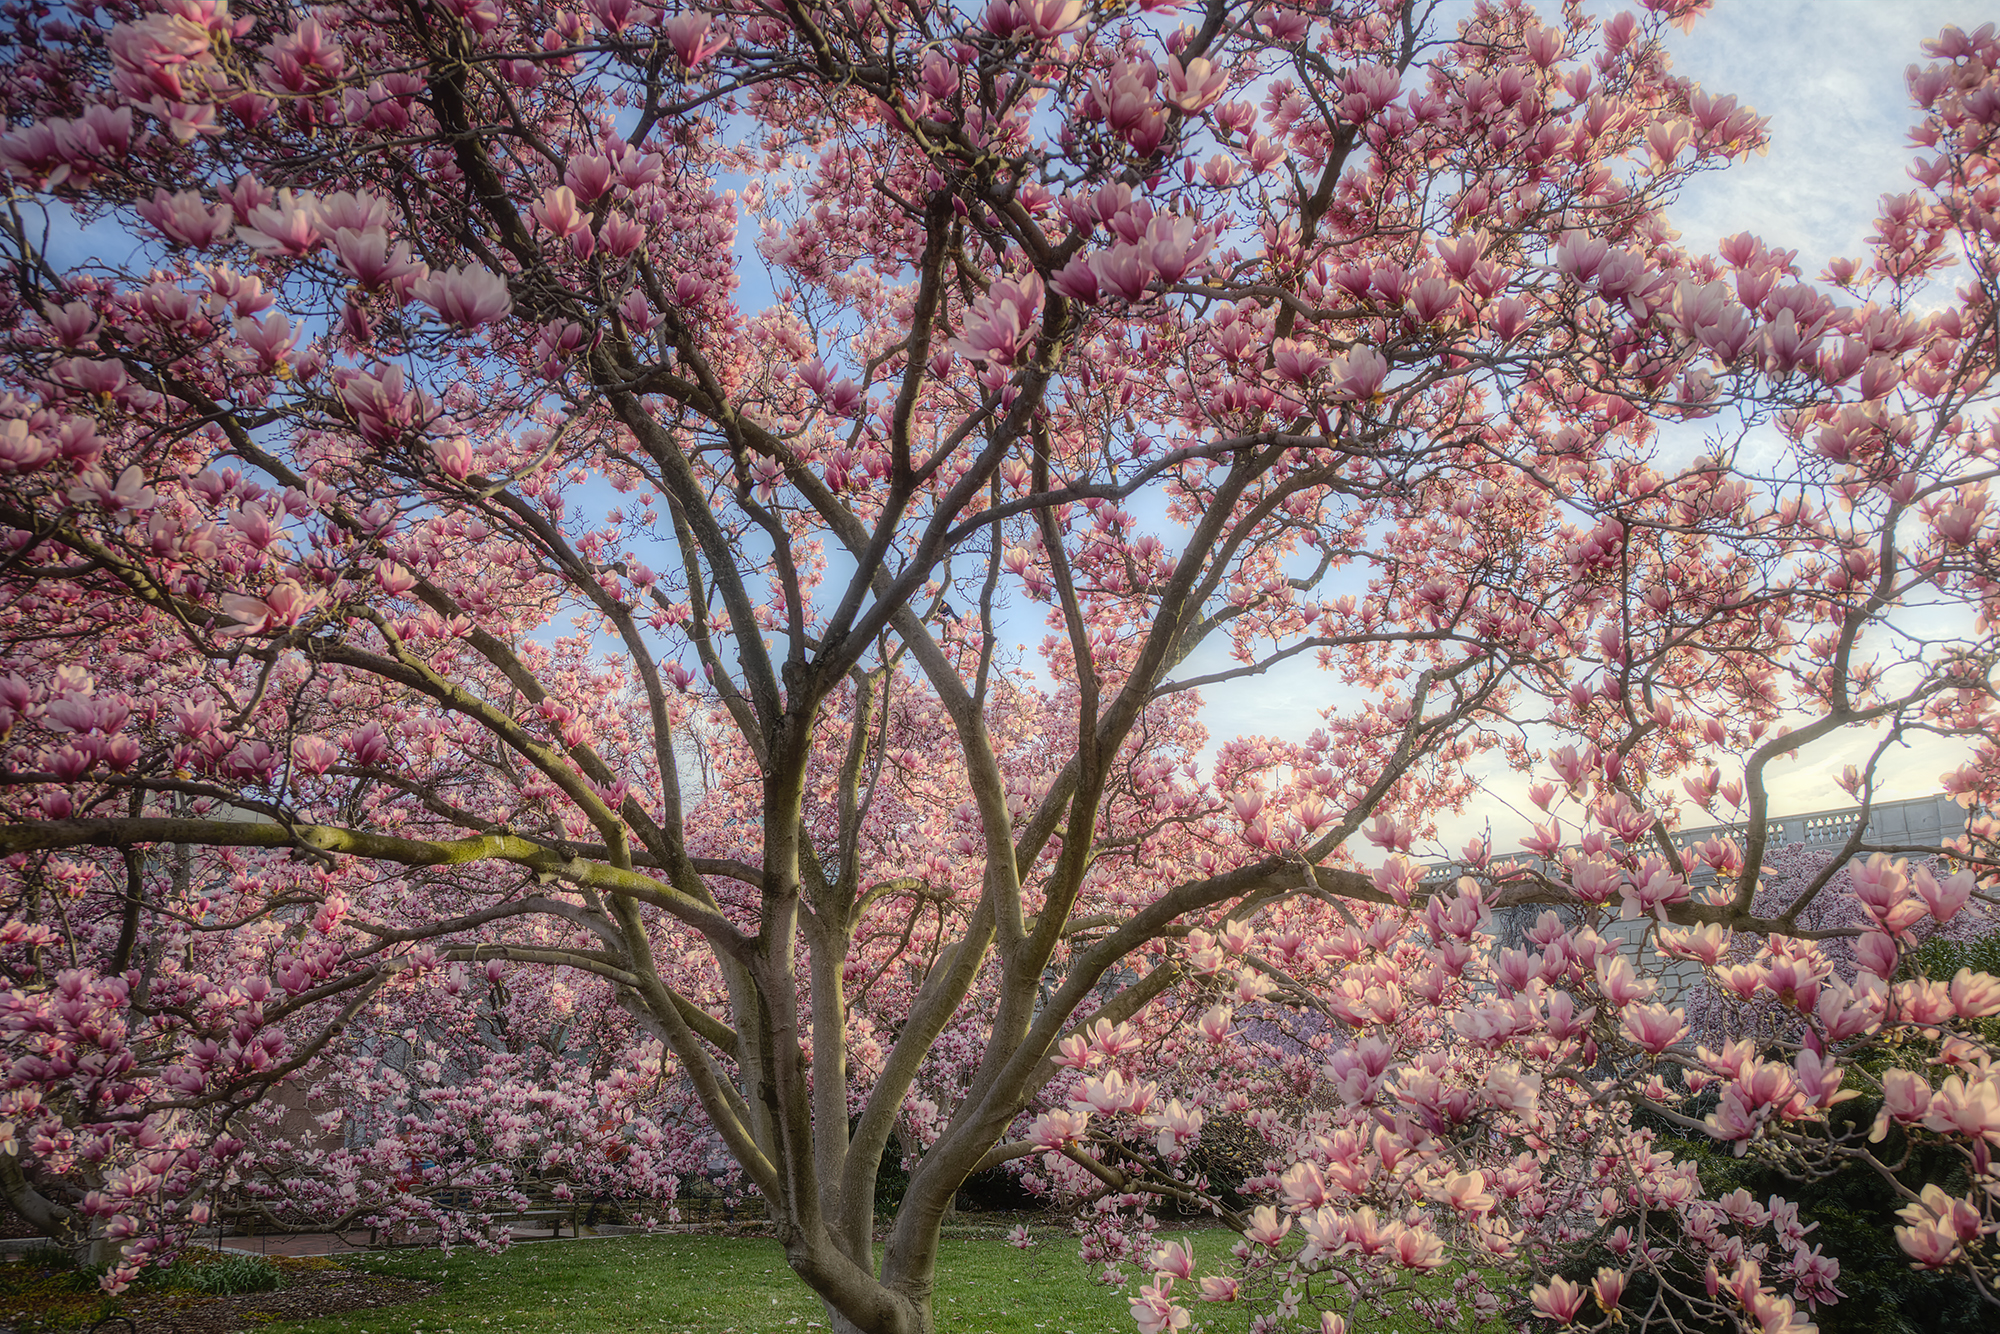 Free Photo Magnolia Trees Blooming Flower Fragrance Free Download Jooinn